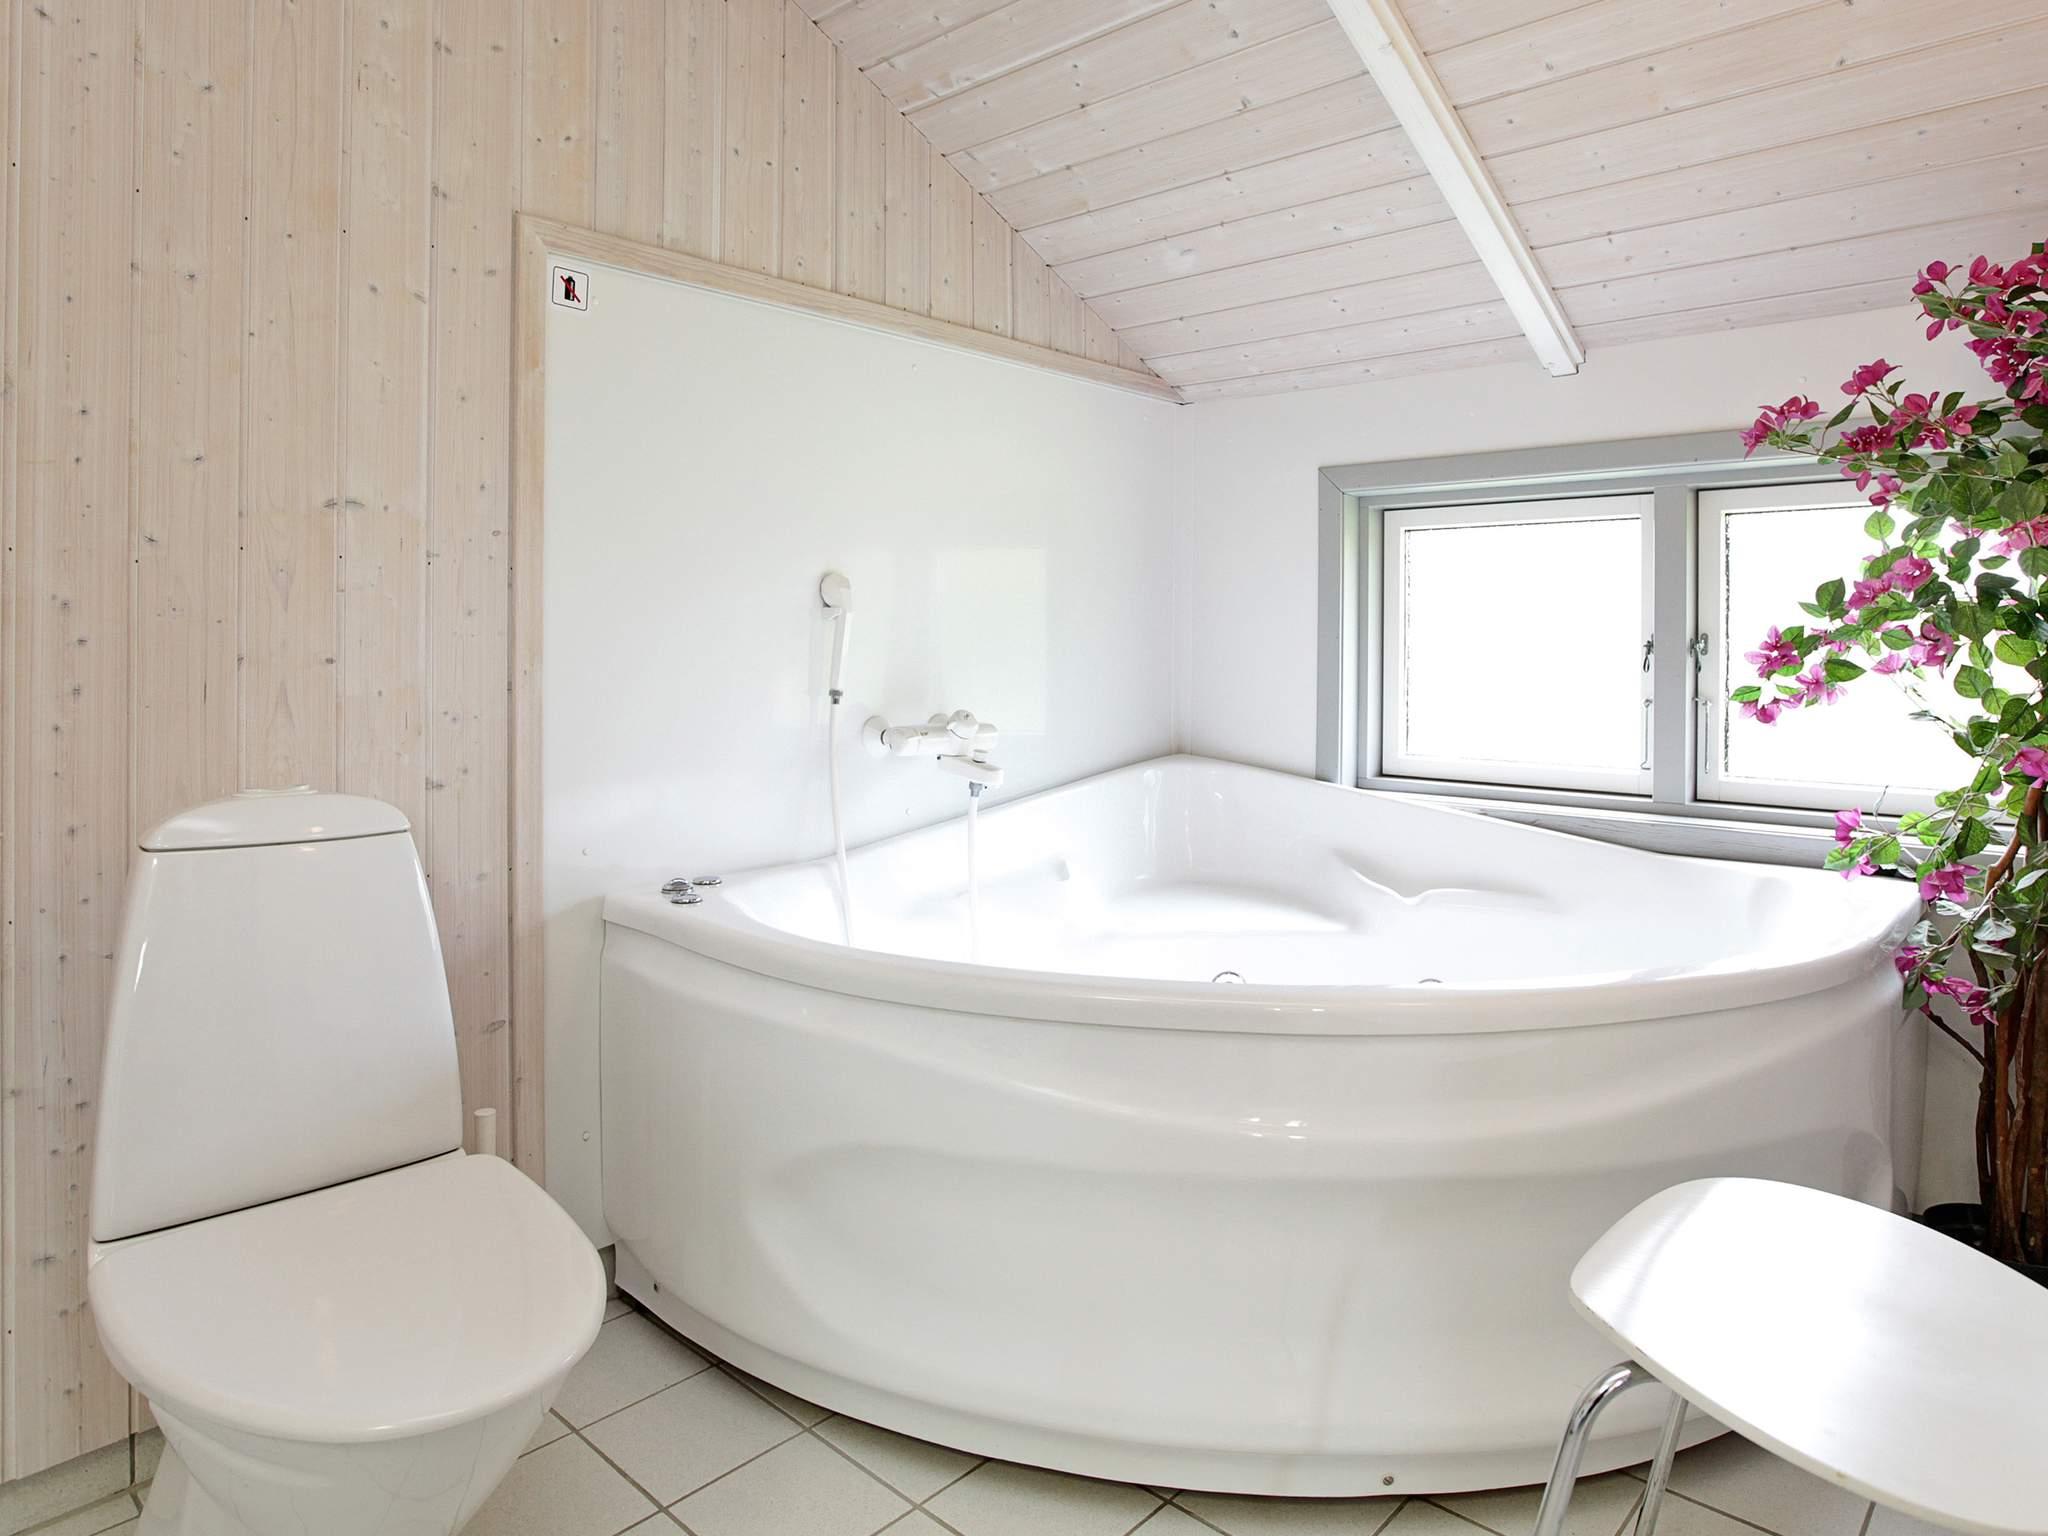 Ferienhaus Bogø (319934), Bogø By, , Seelandinseln, Dänemark, Bild 18